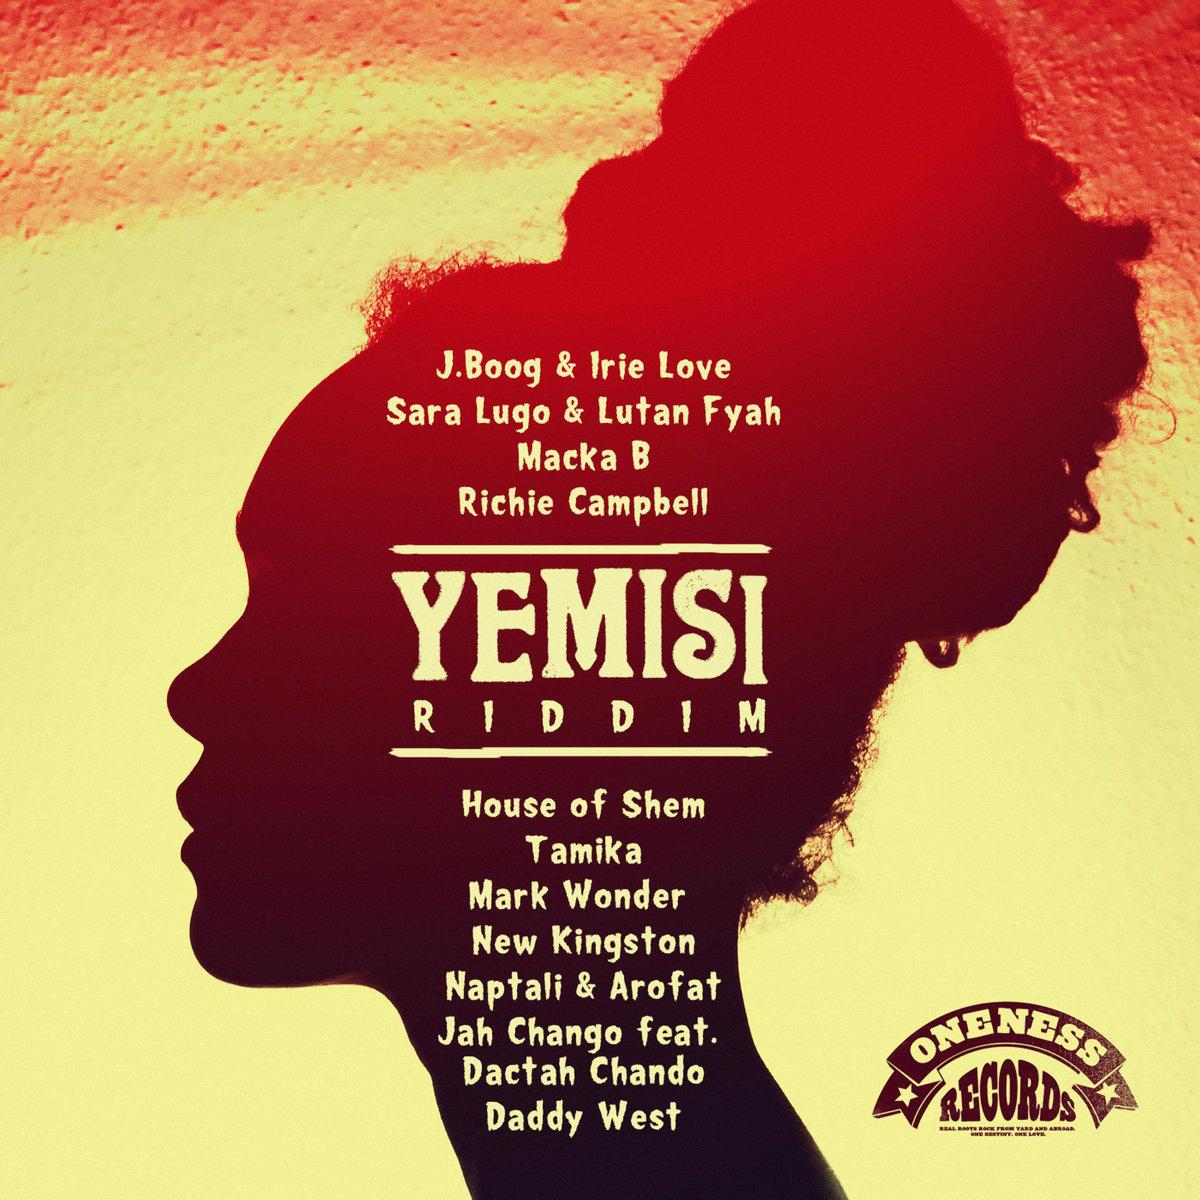 Yemisi Riddim Selection | Oneness-Records